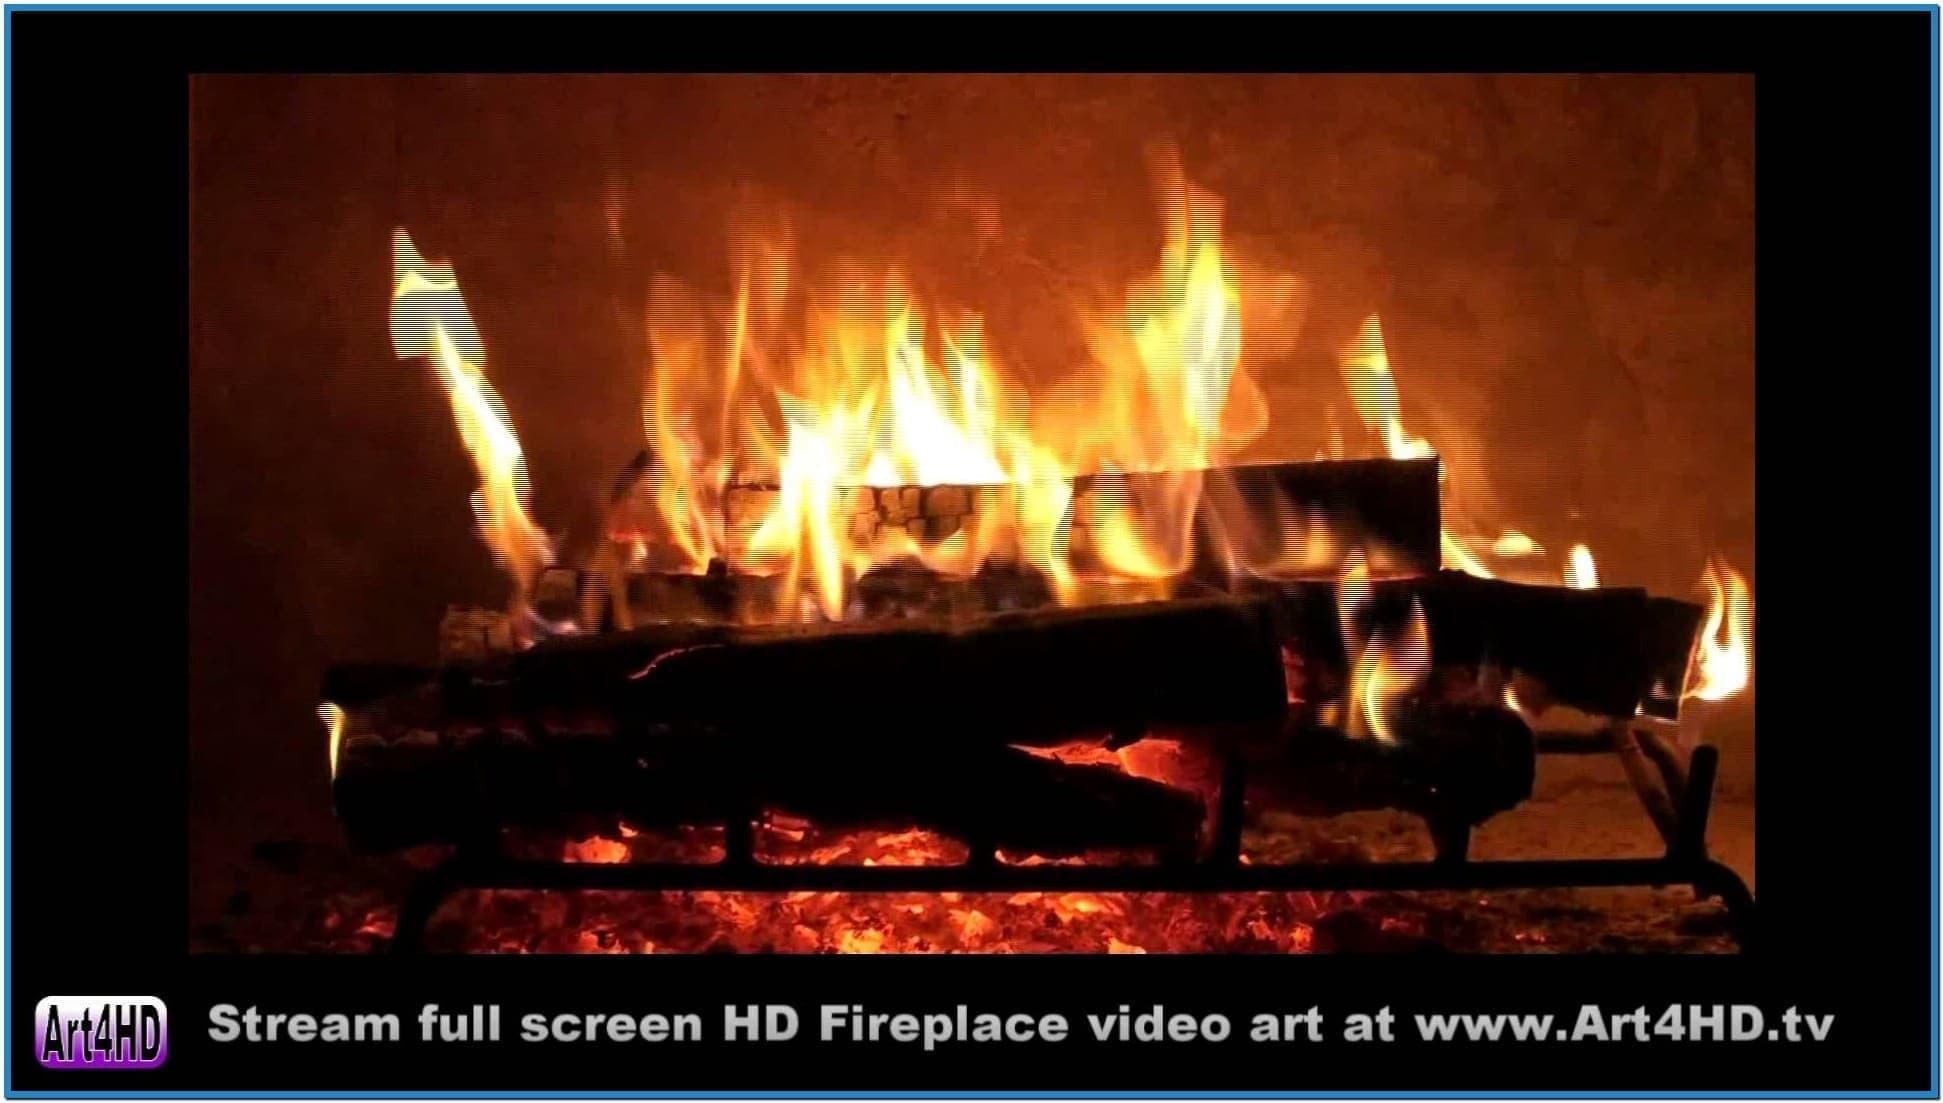 Burning log fire screensaver   Download 1943x1103